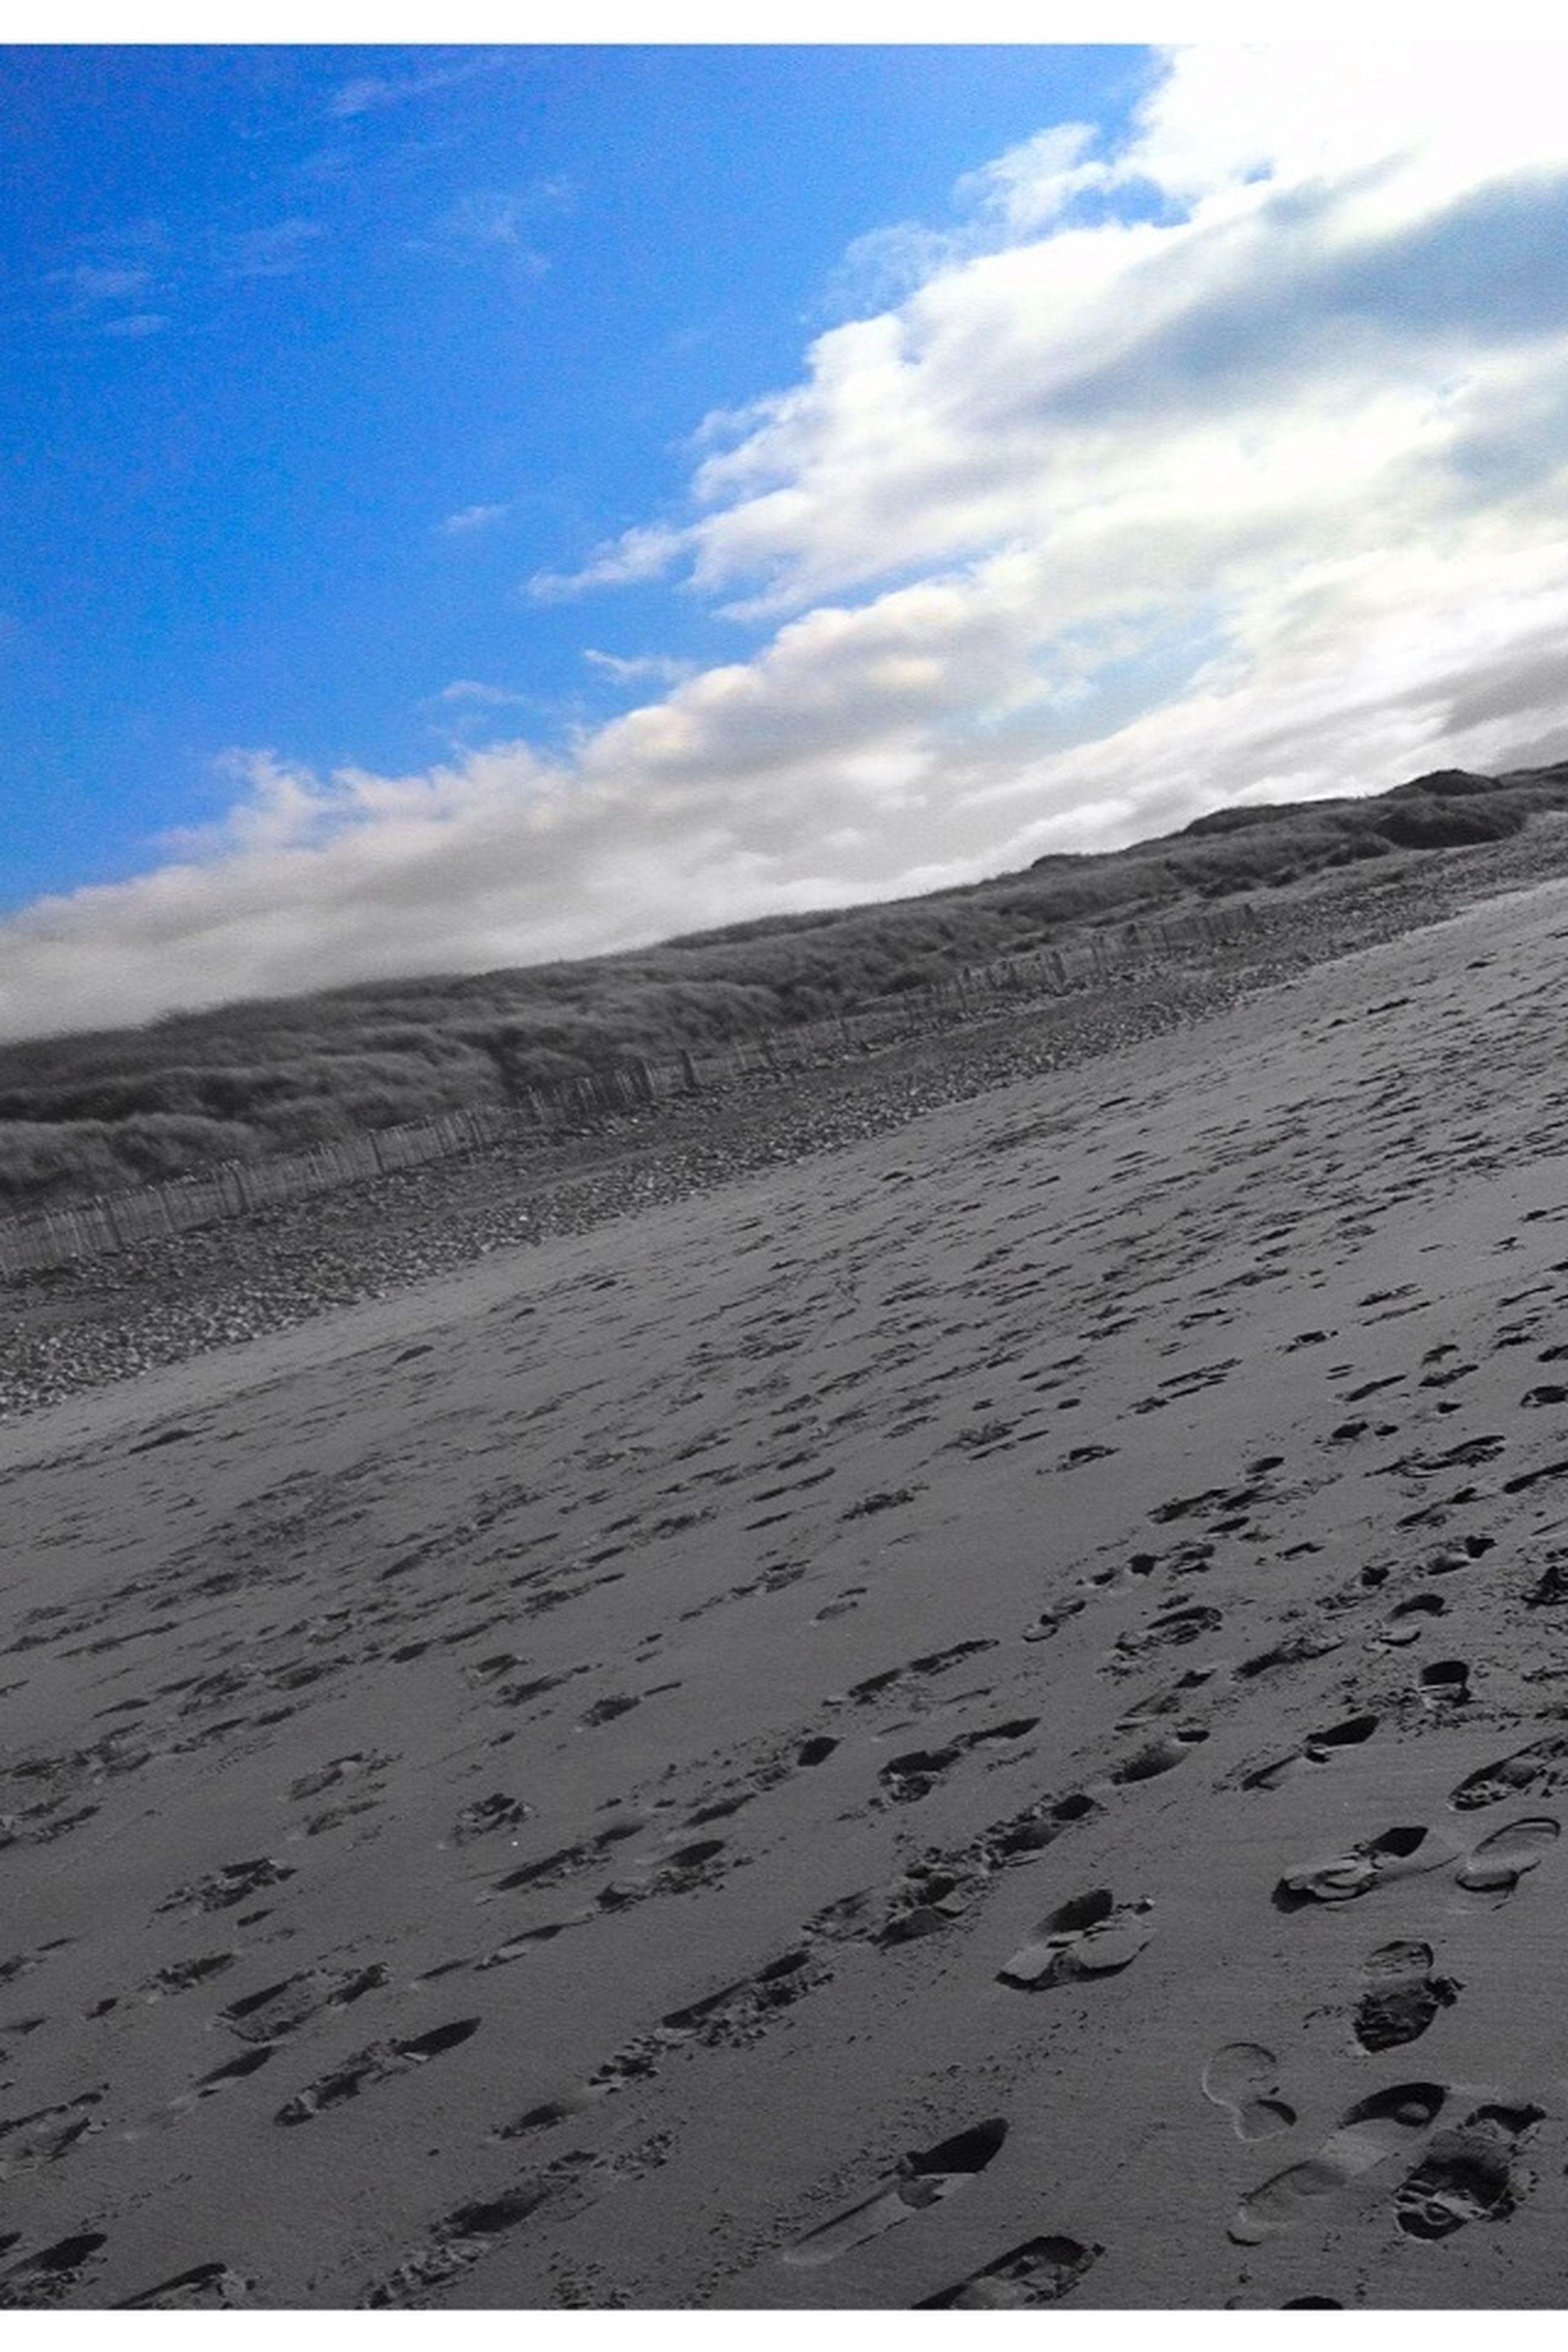 sand, beach, sky, tranquil scene, tranquility, scenics, beauty in nature, nature, sea, cloud - sky, shore, footprint, landscape, cloud, remote, idyllic, sand dune, day, desert, non-urban scene